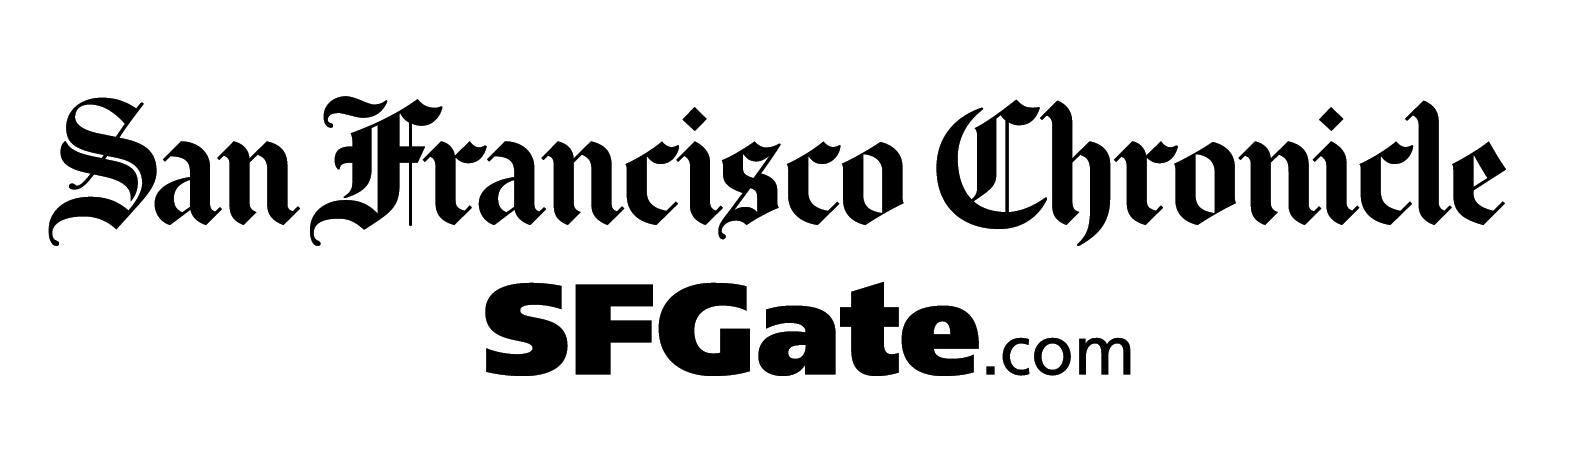 SF Chronicle Logo (2 line) (1).jpg